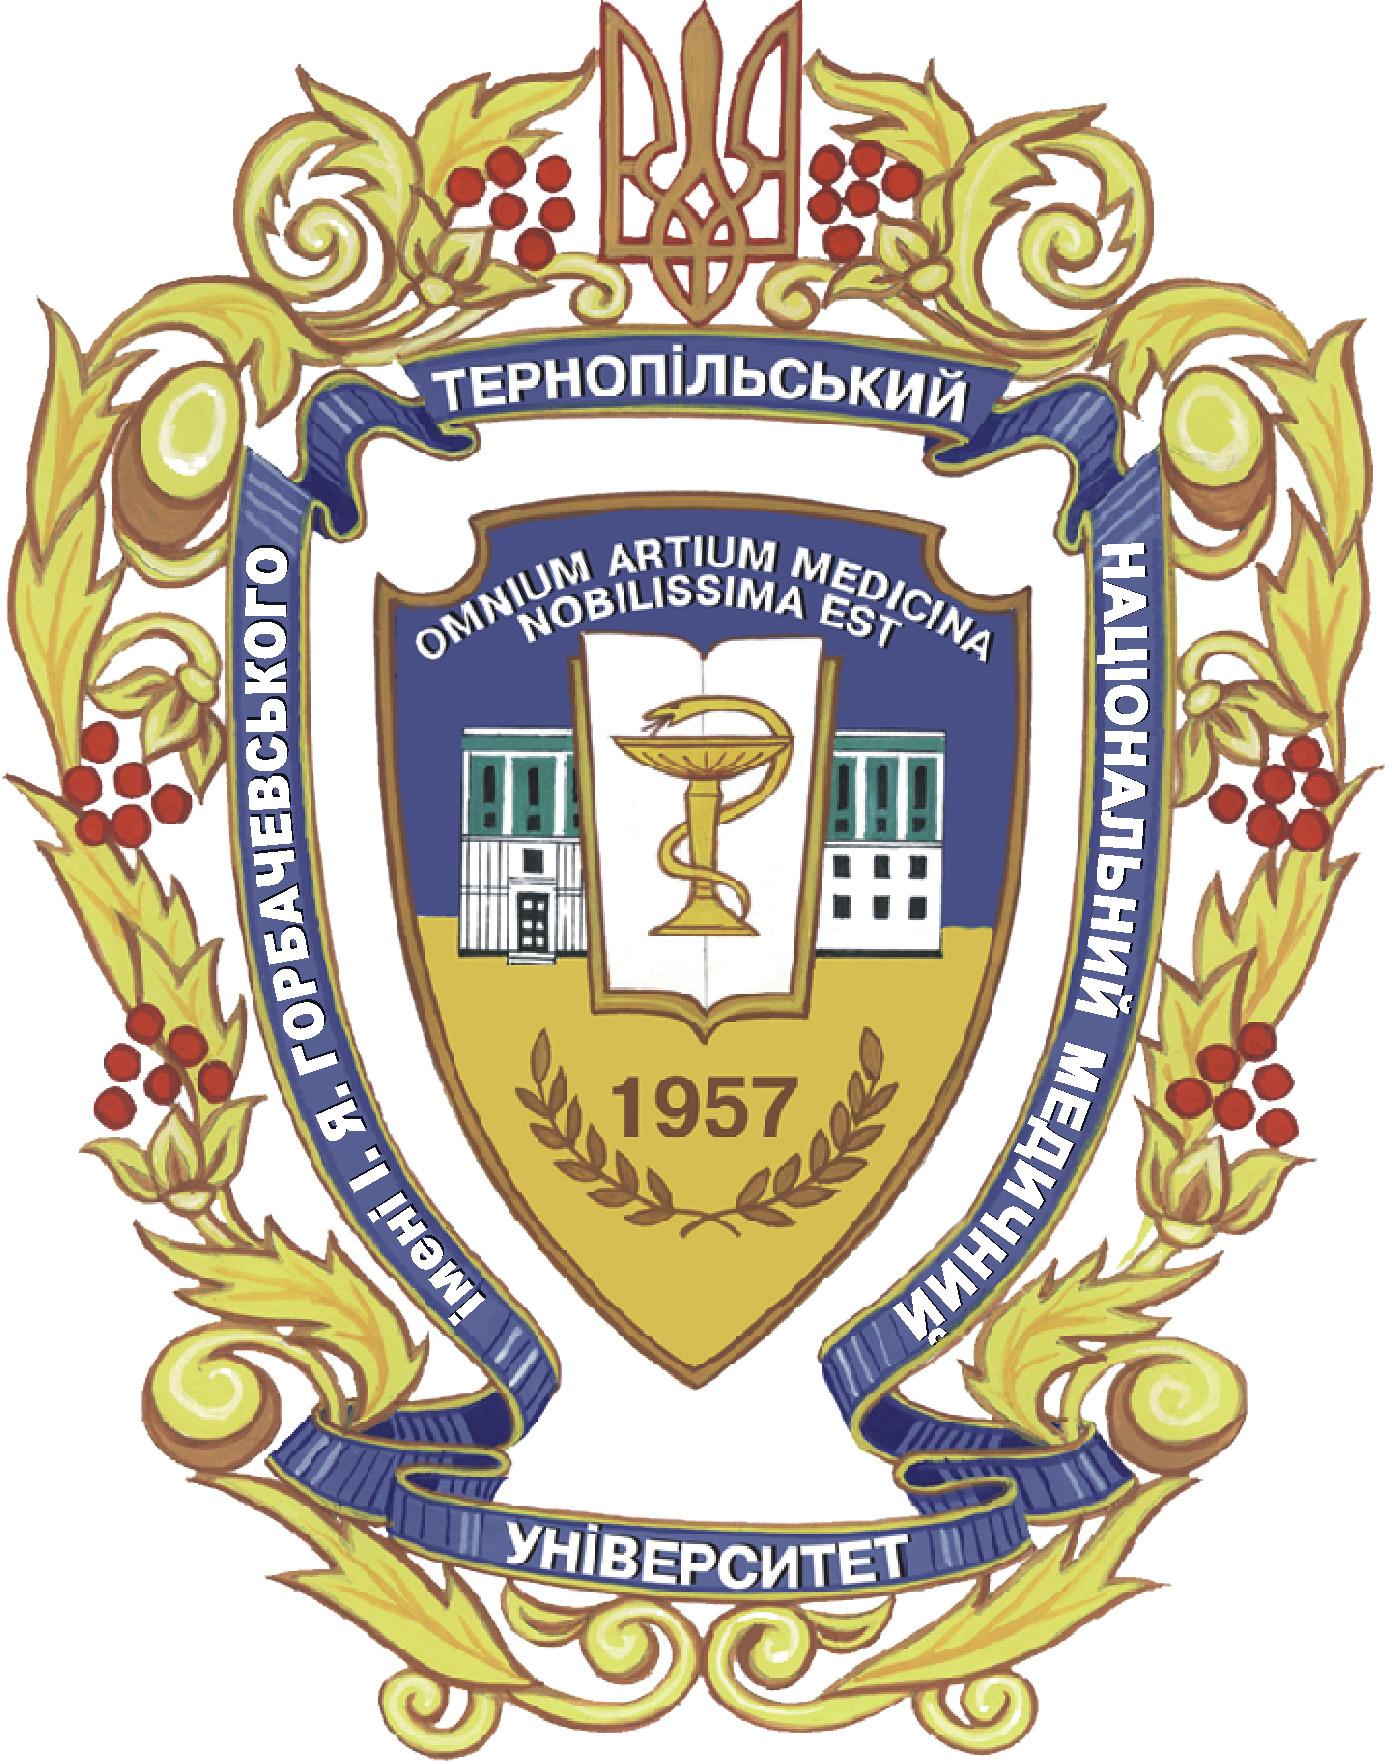 I.Ya. Horbachevsky Ternopil National Medical University of Ministry of Health Care of Ukraine